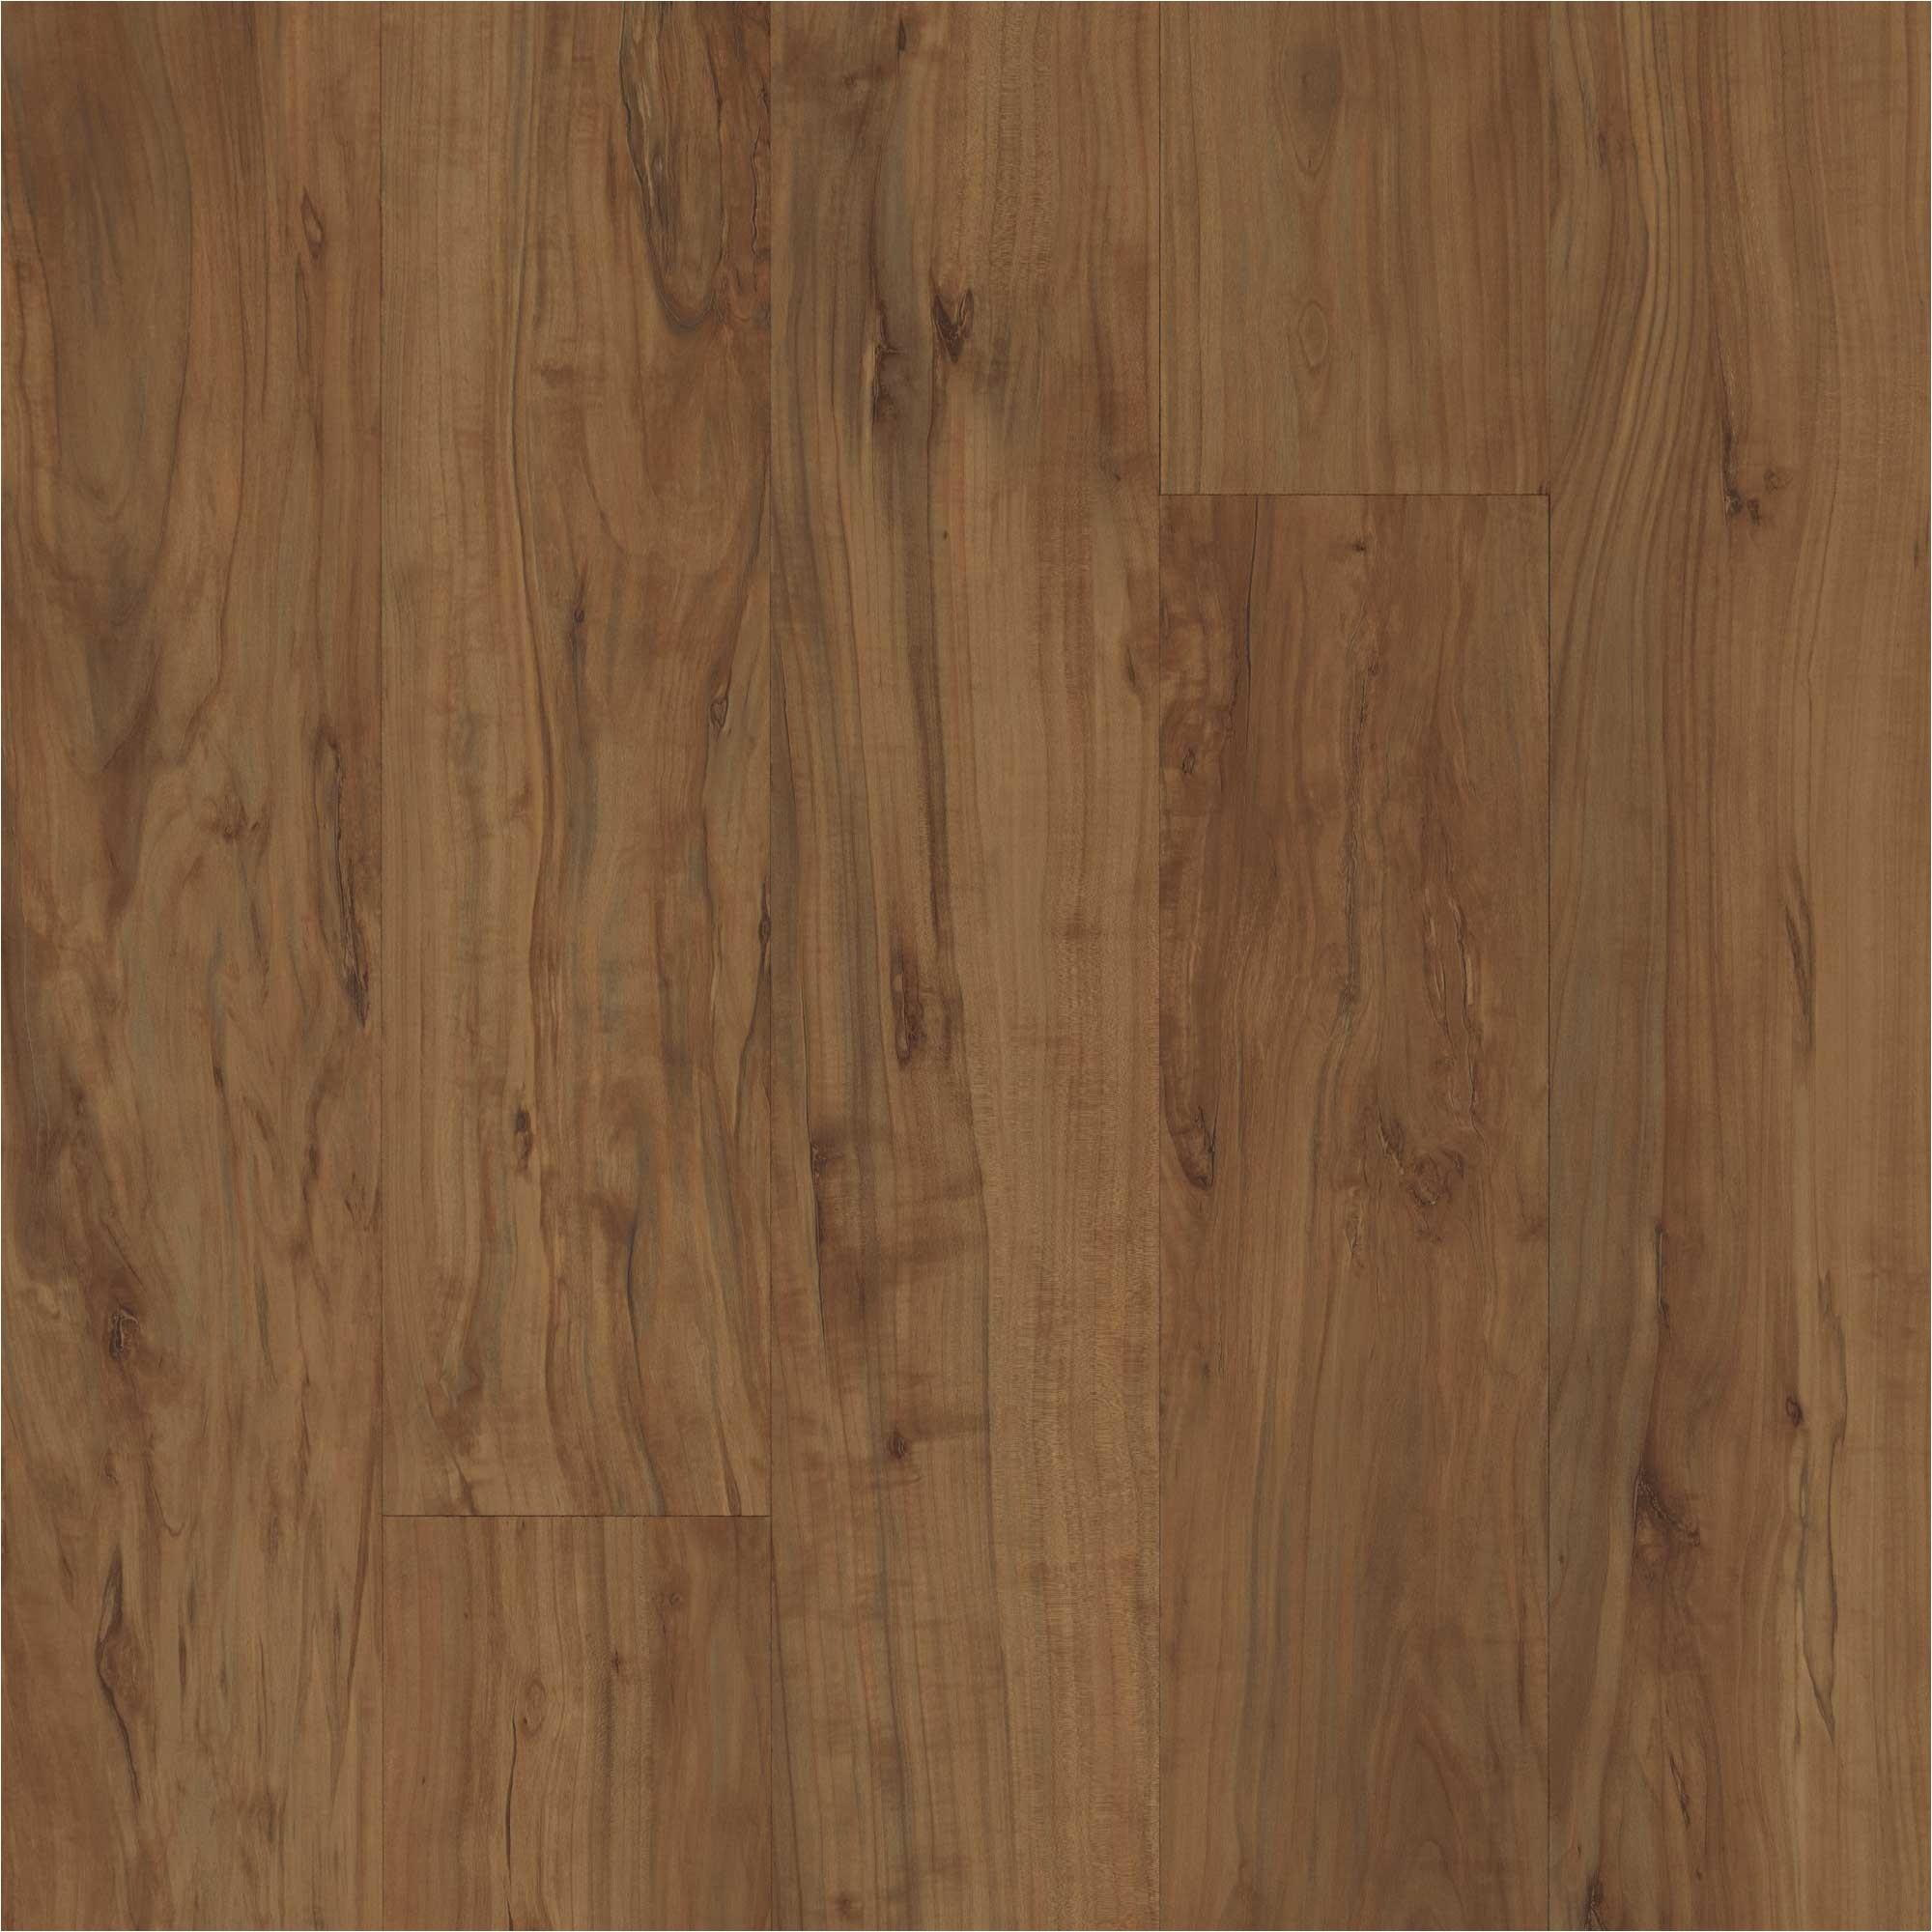 16452 premier glueless laminate flooring chestnut oak